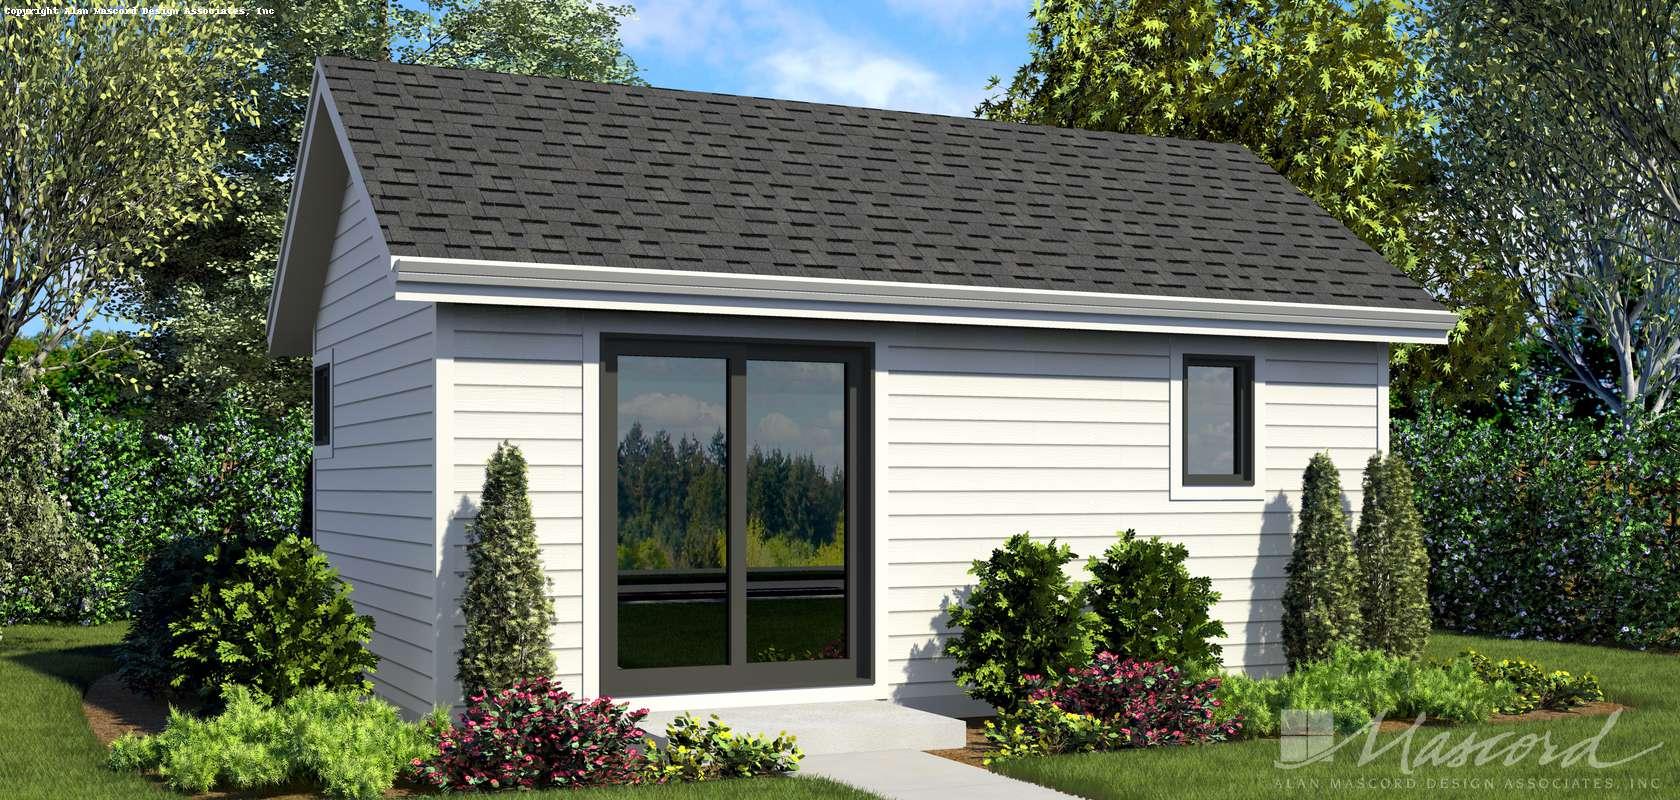 Mascord House Plan 1181: The Moorpark